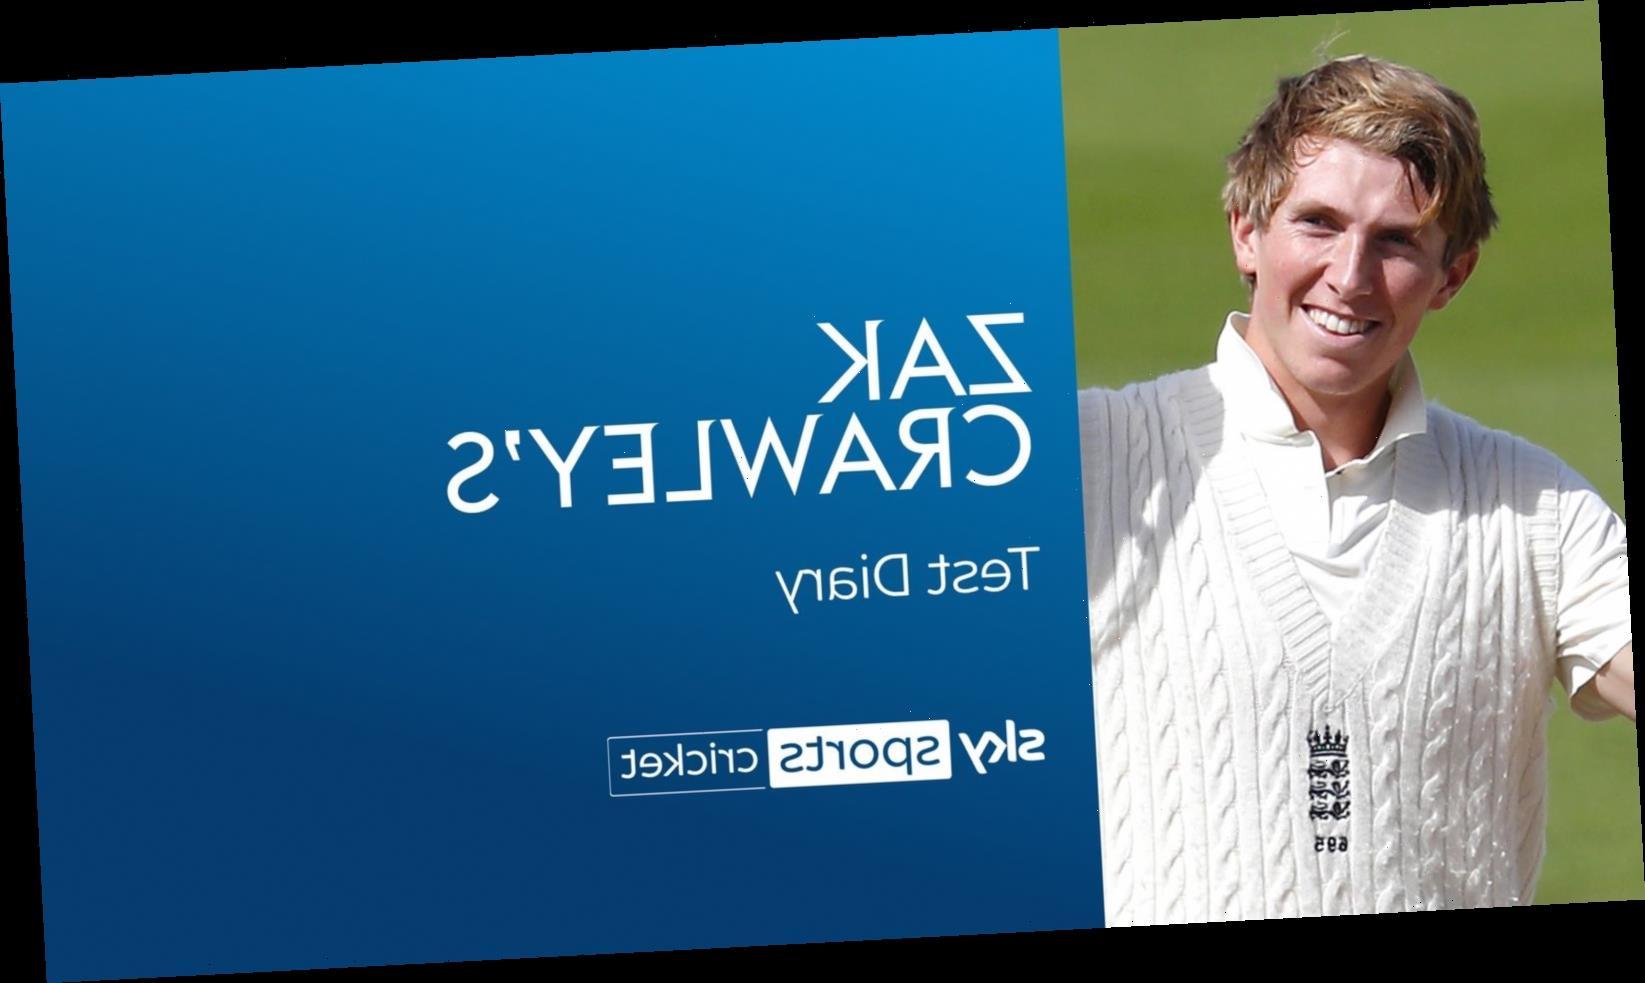 England batsman Zak Crawley on 267 vs Pakistan and how Rob Key fuelled international ambitions